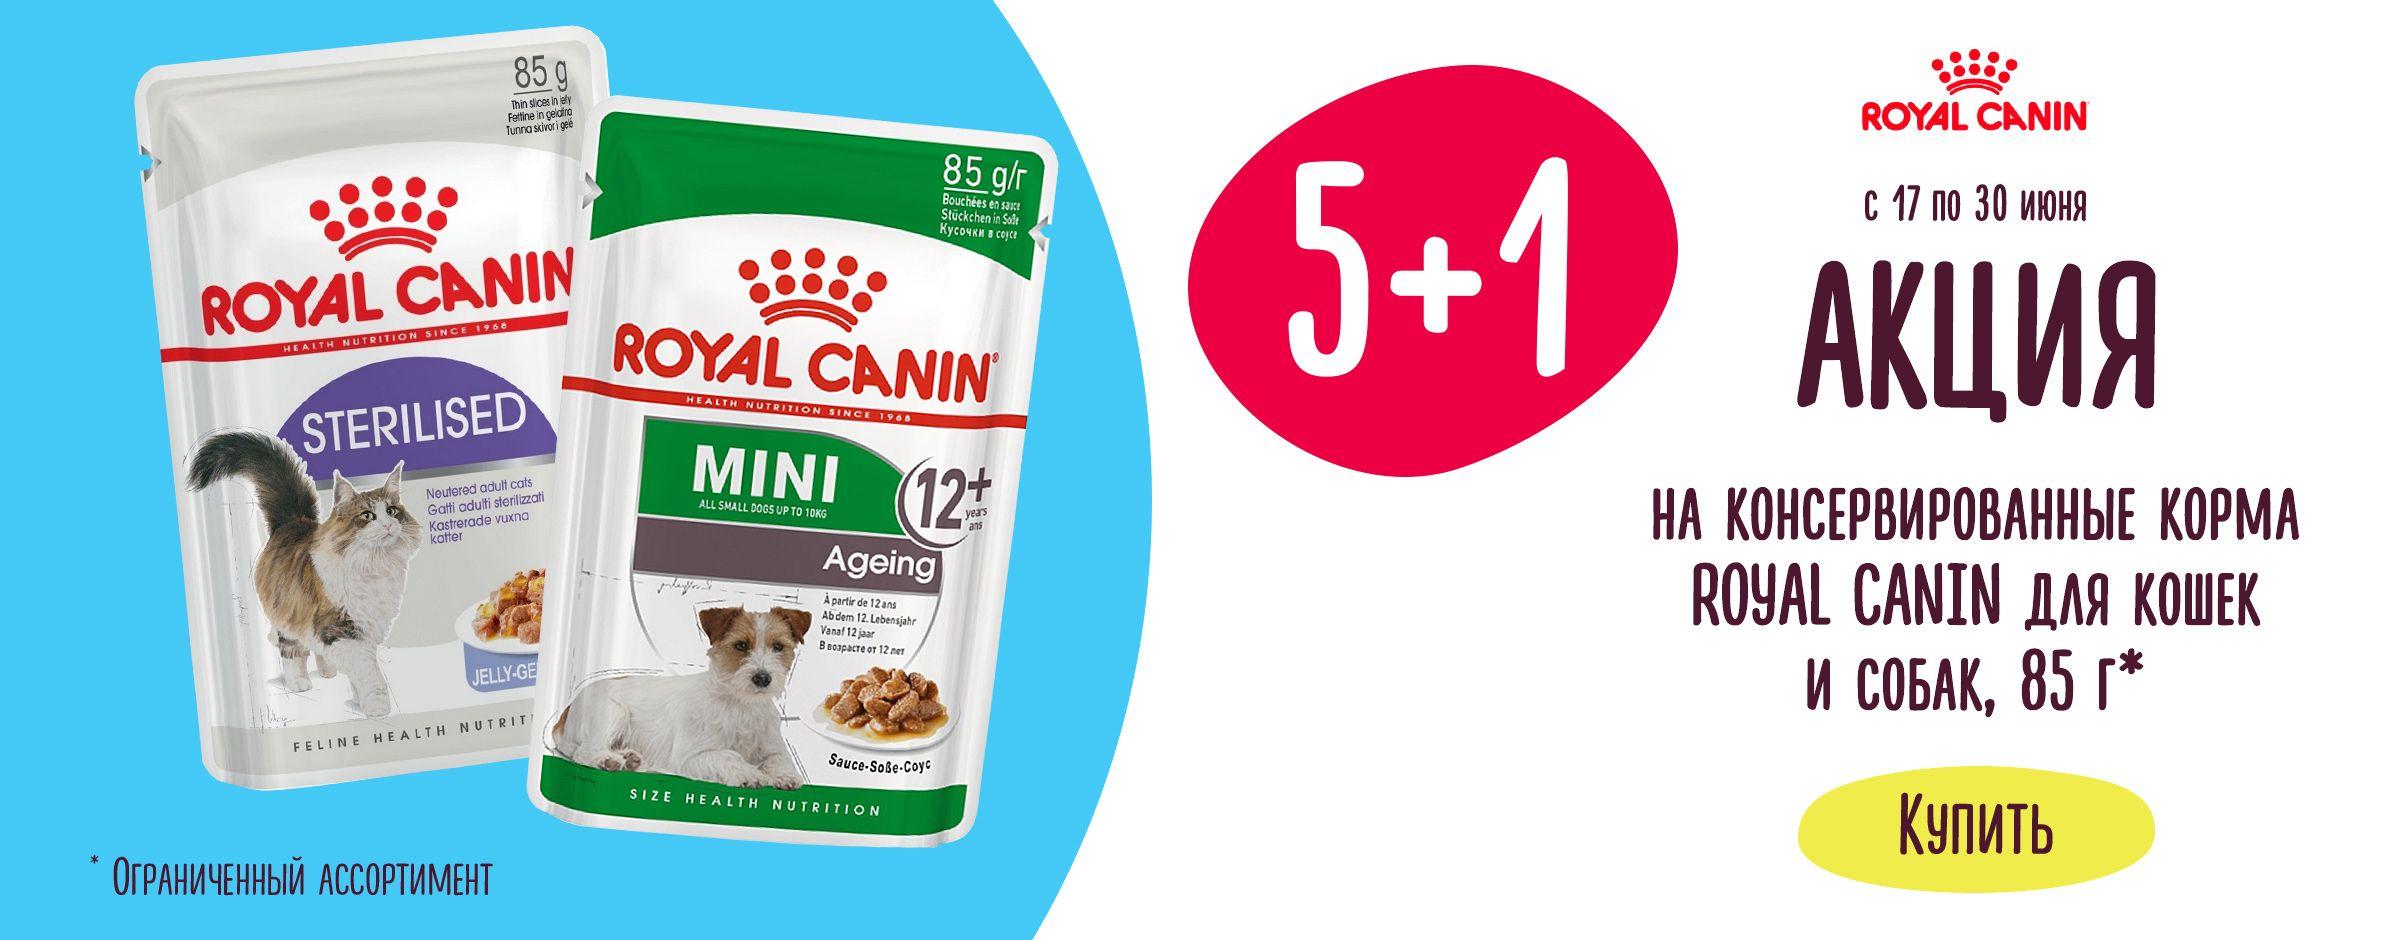 Royal Canin 5+1 Листовка 12